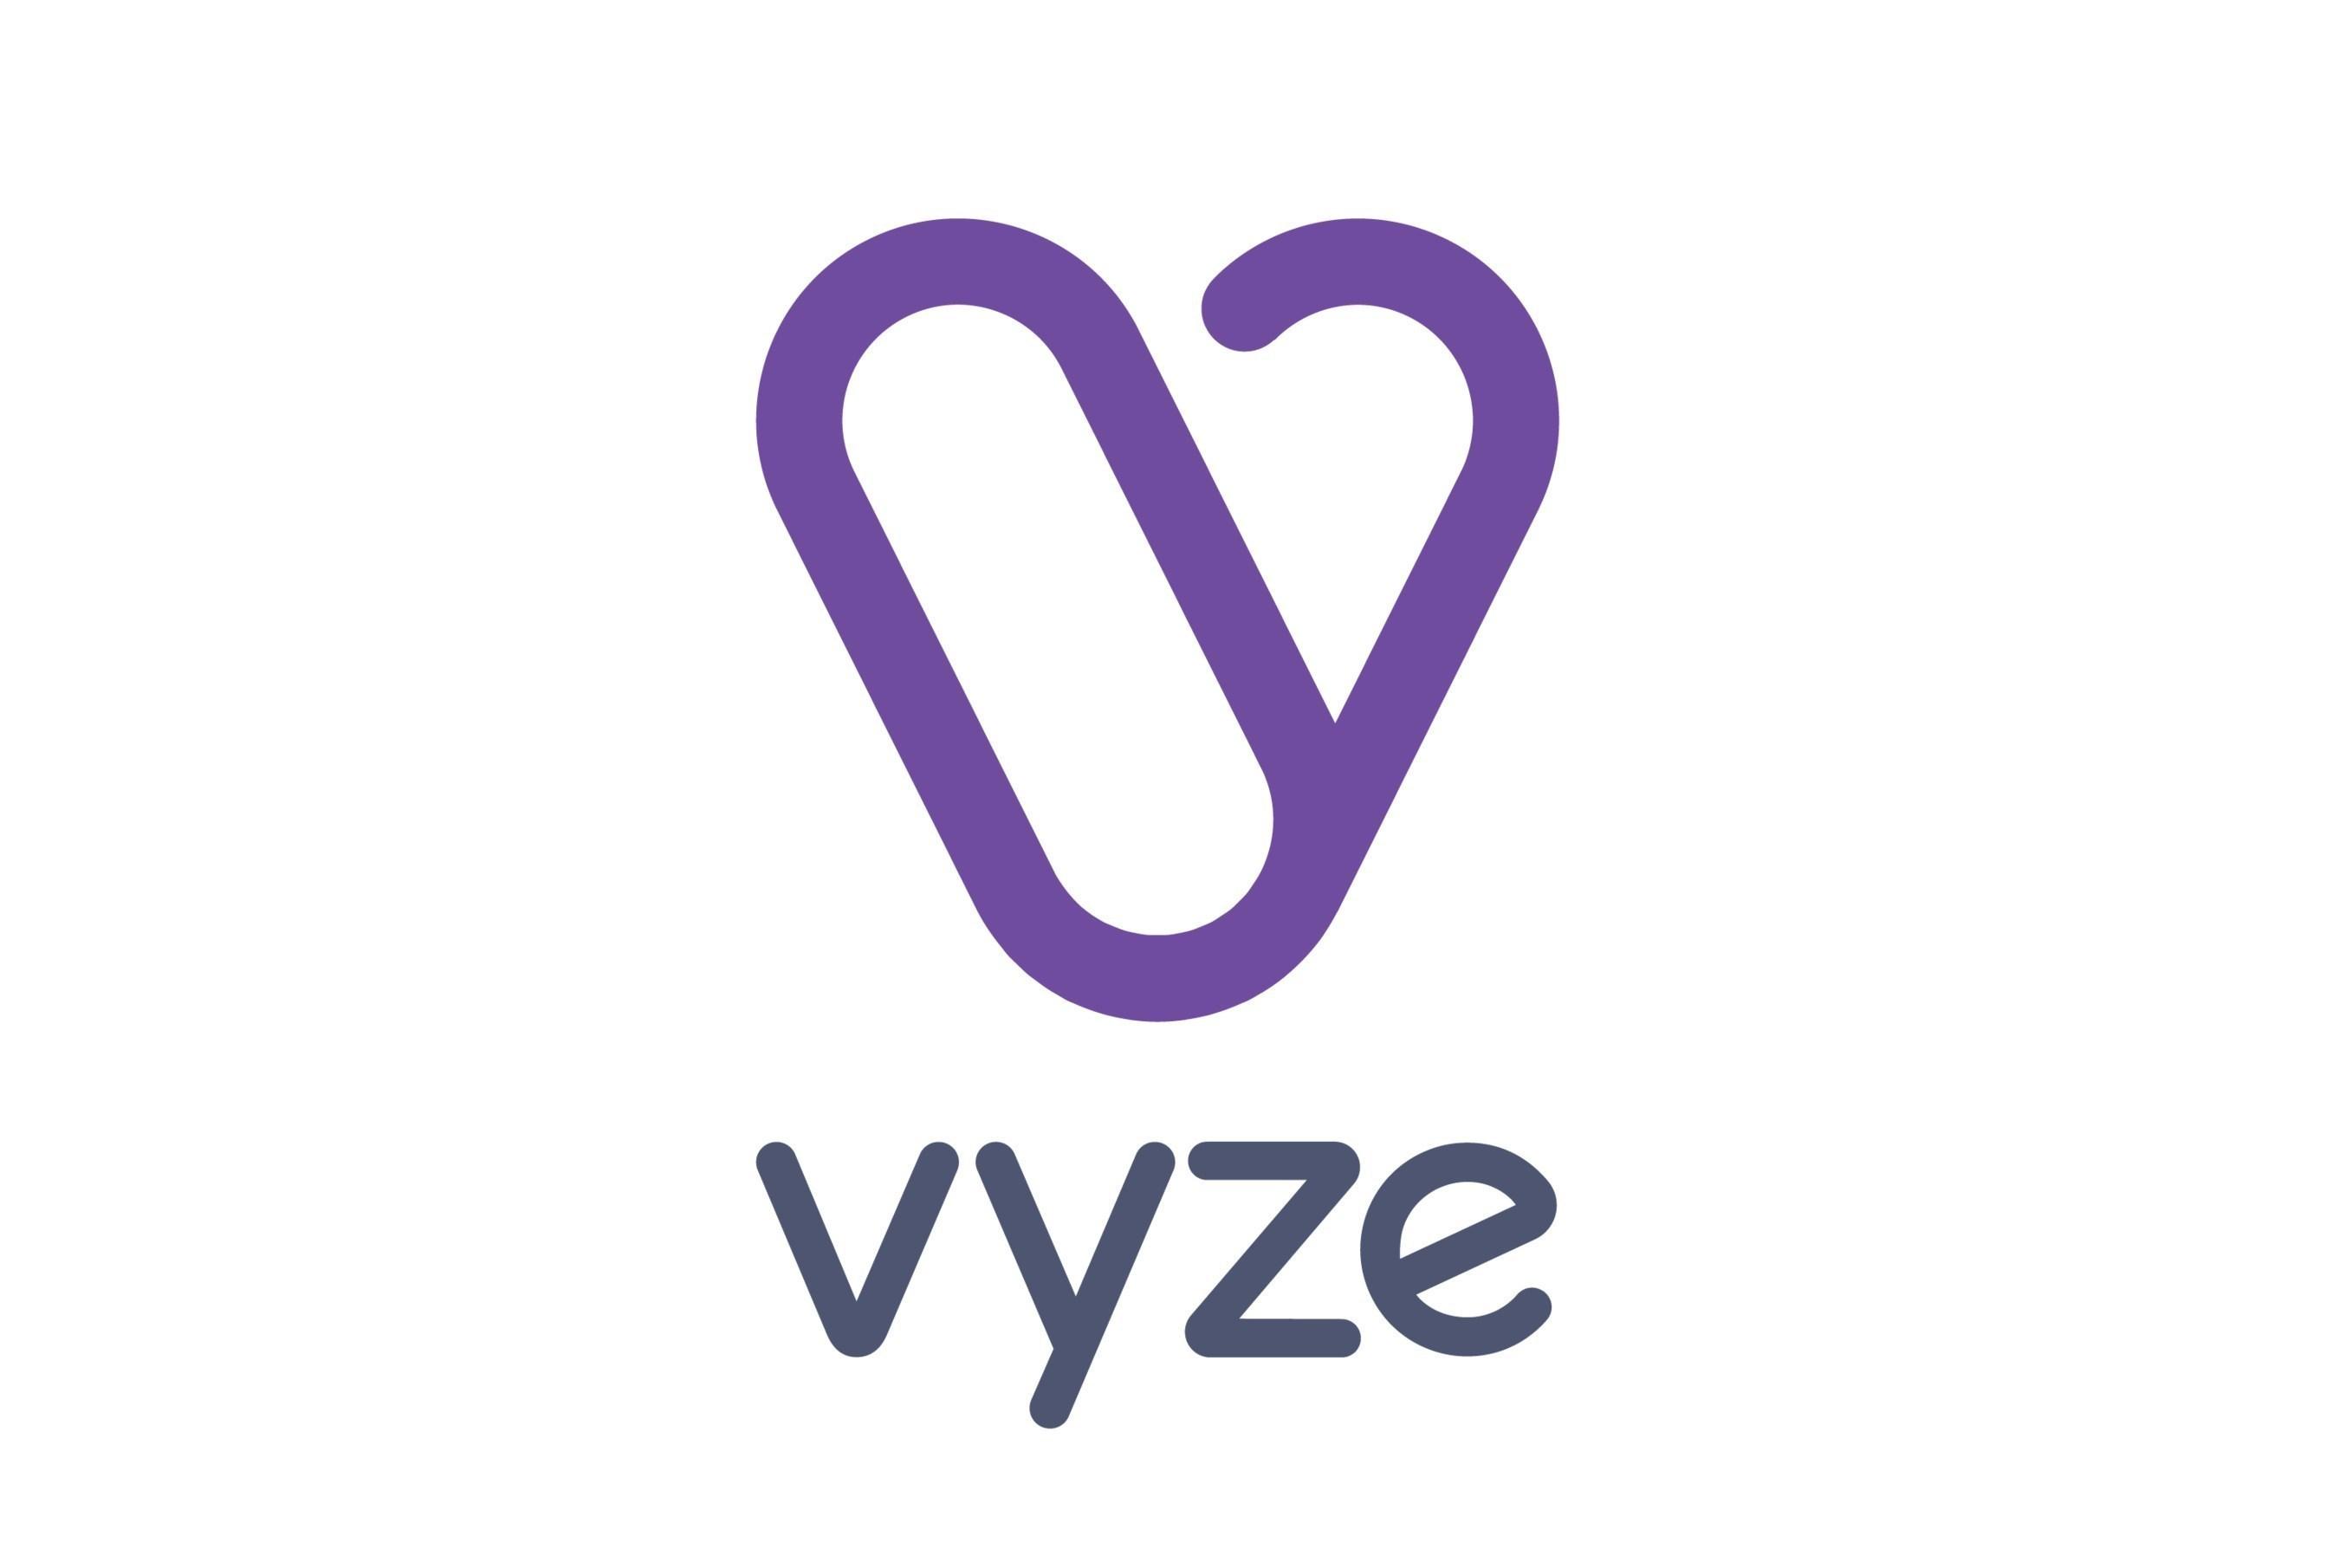 Vyze Logo